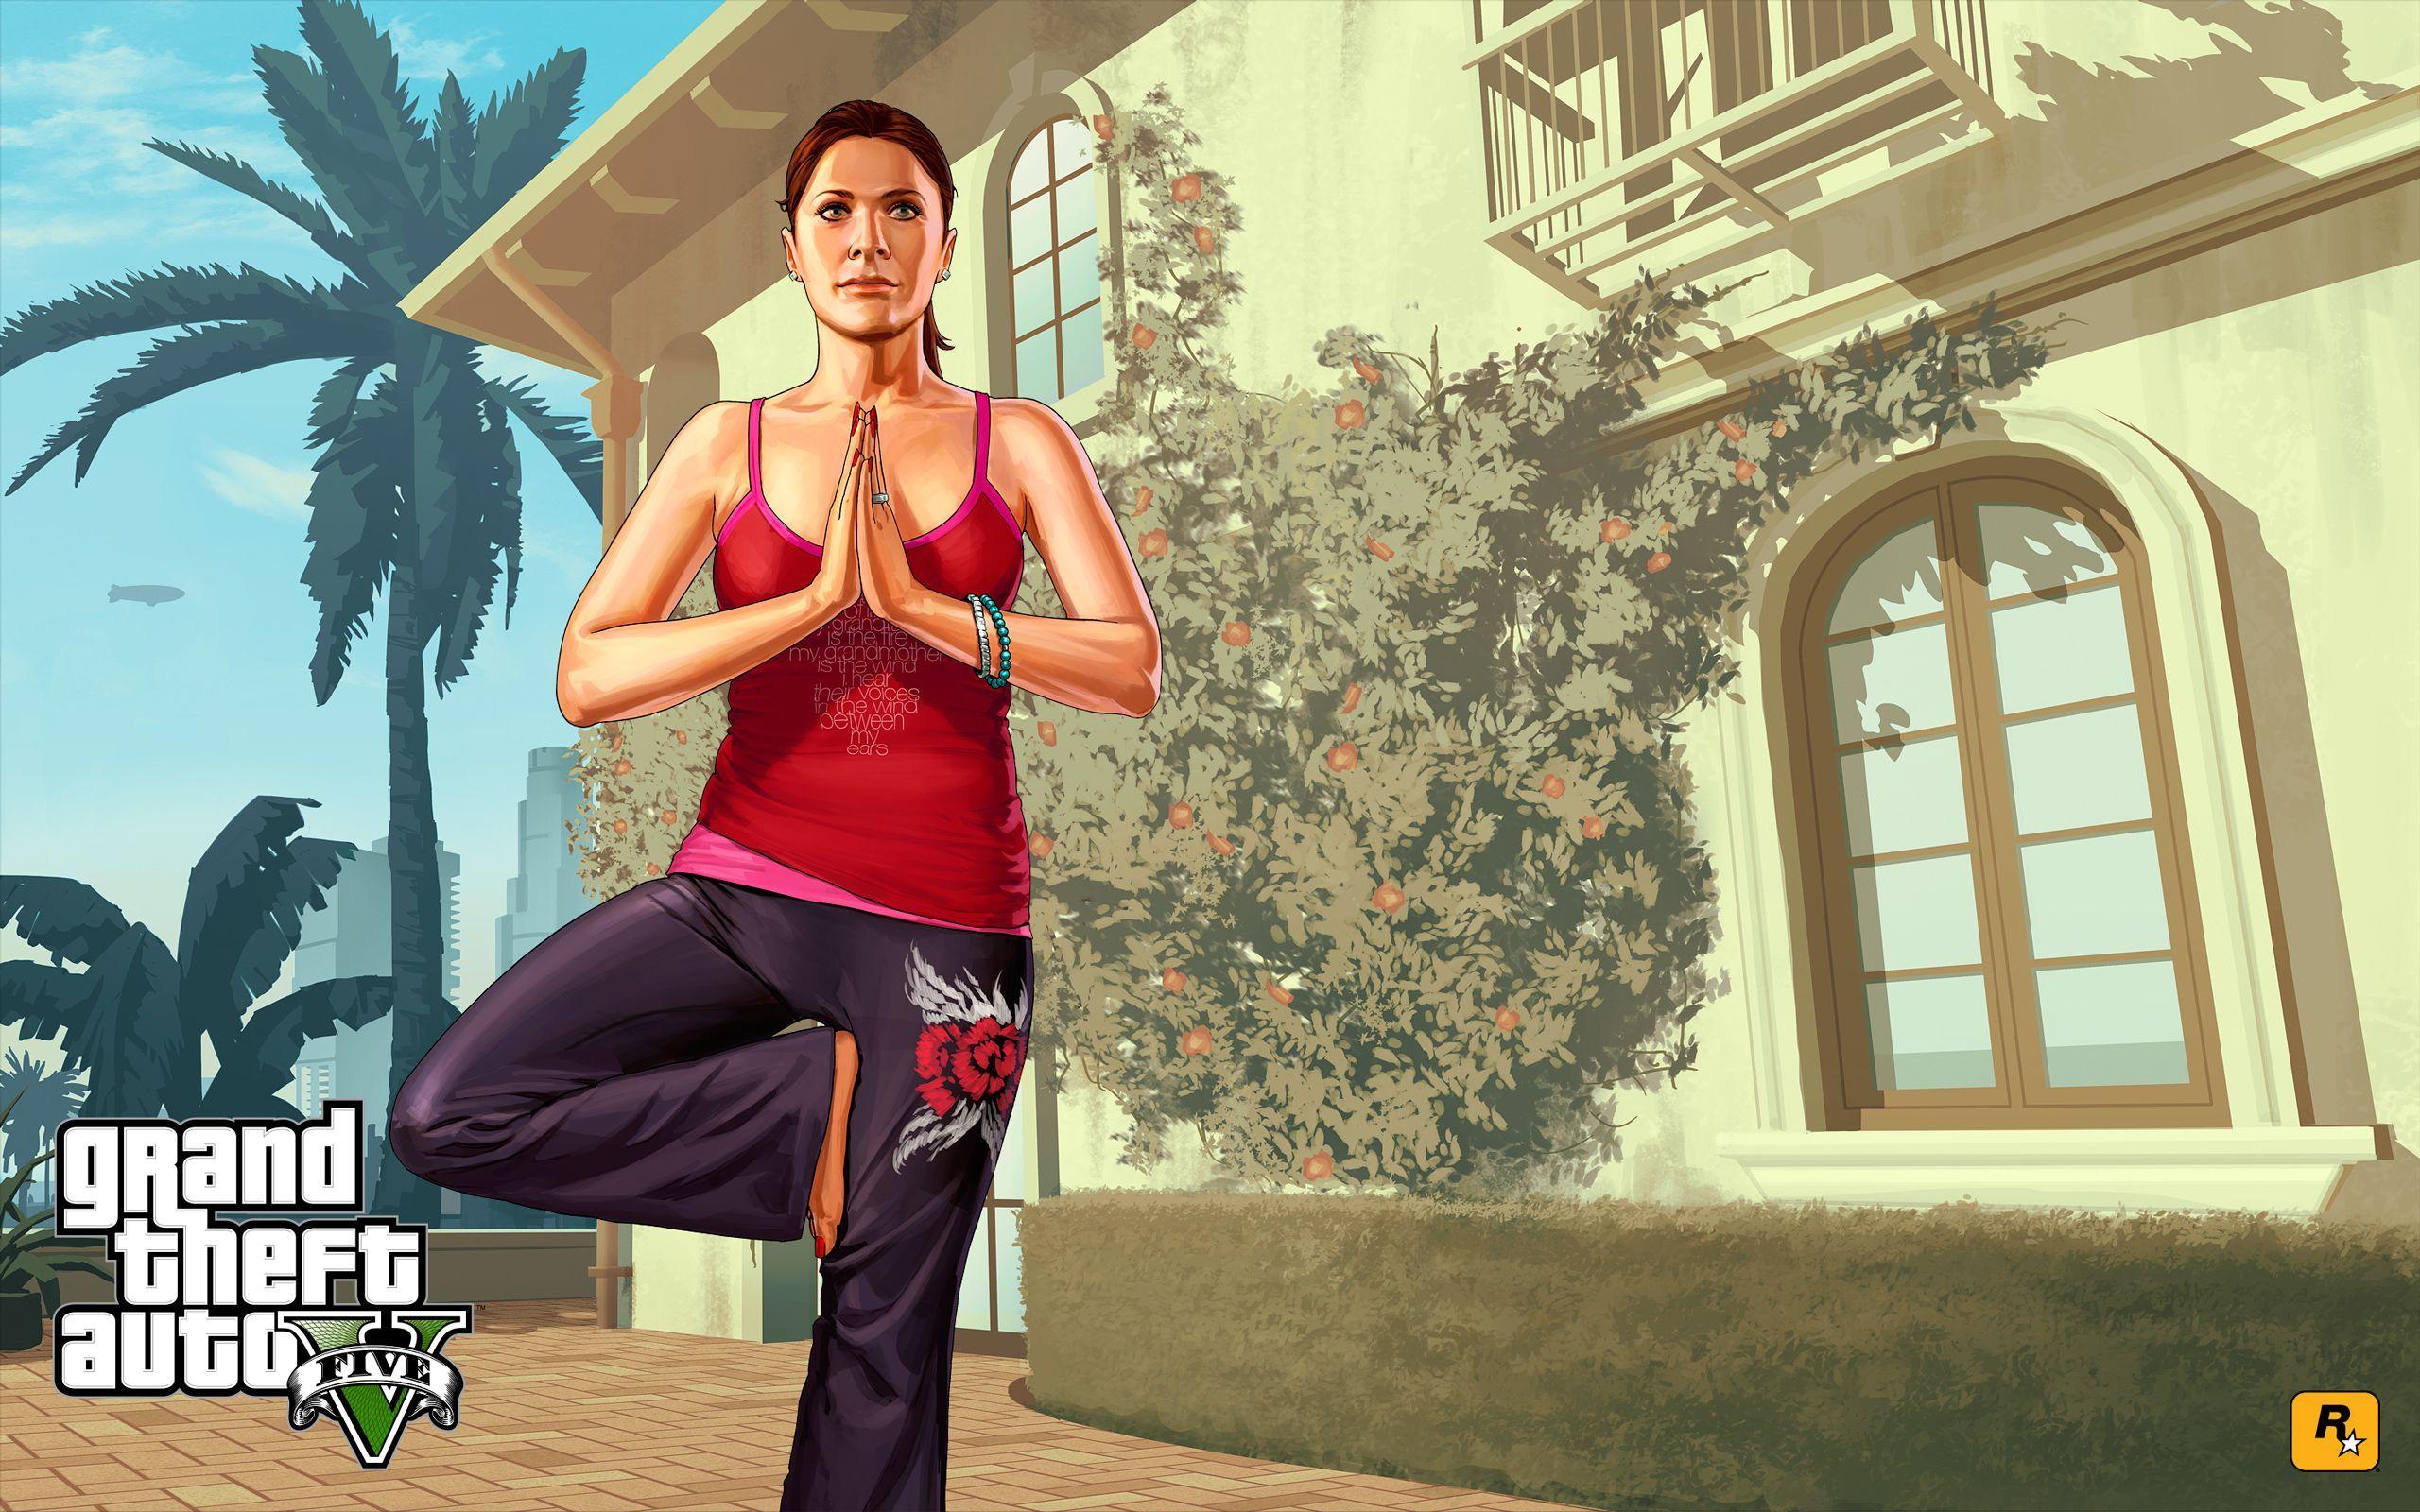 Gta V Amanda Grand Theft Auto Gta Gta 5